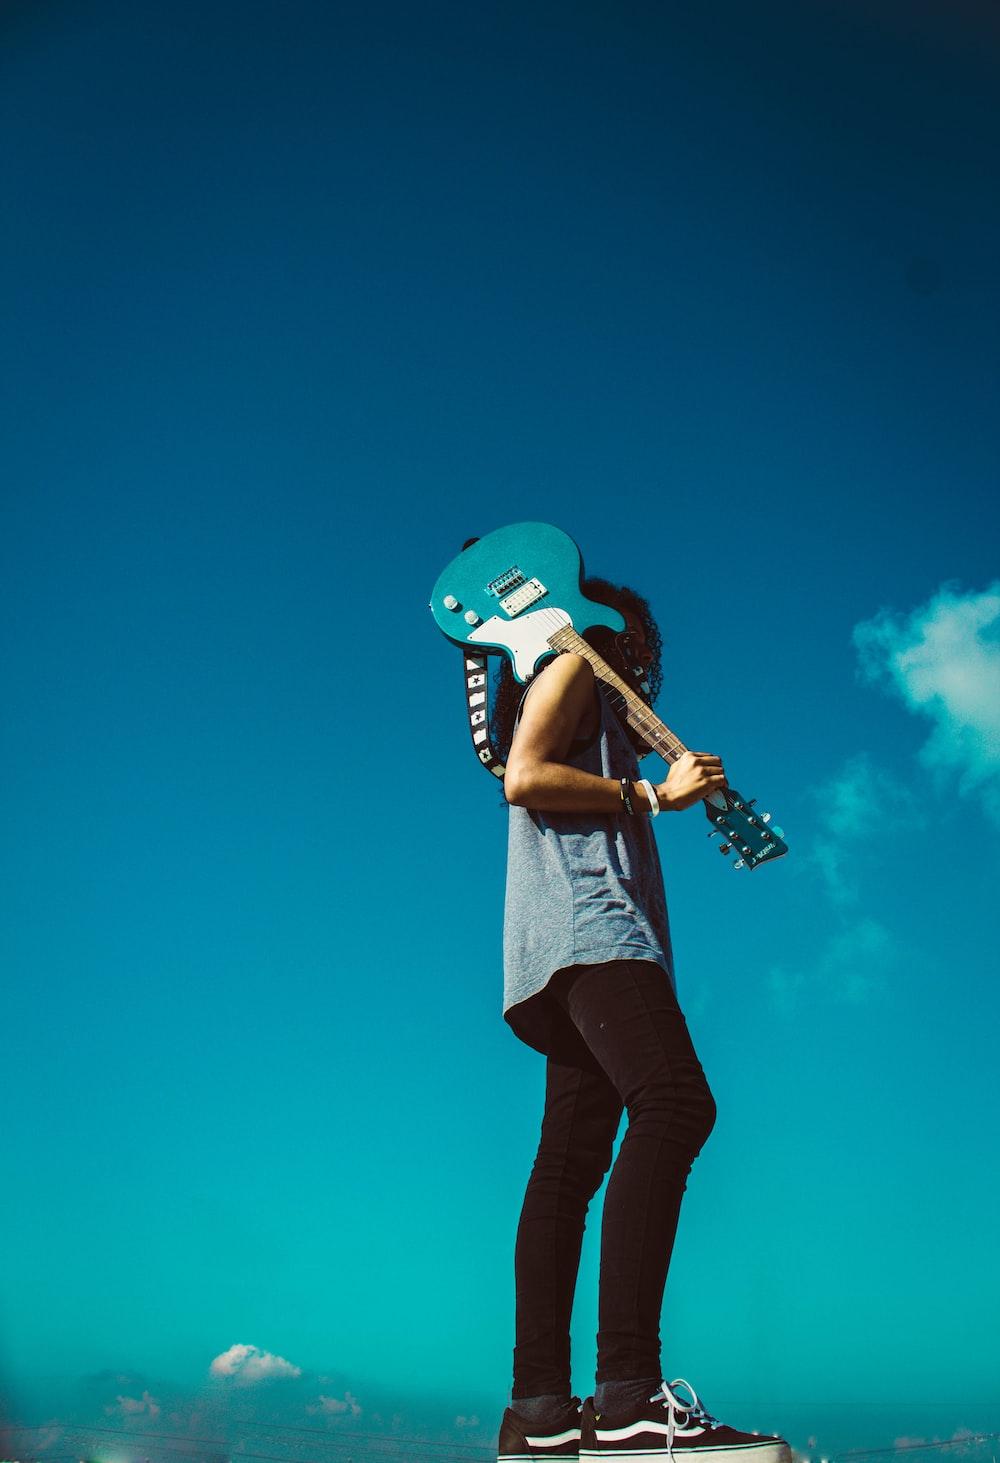 man holding blue guitar